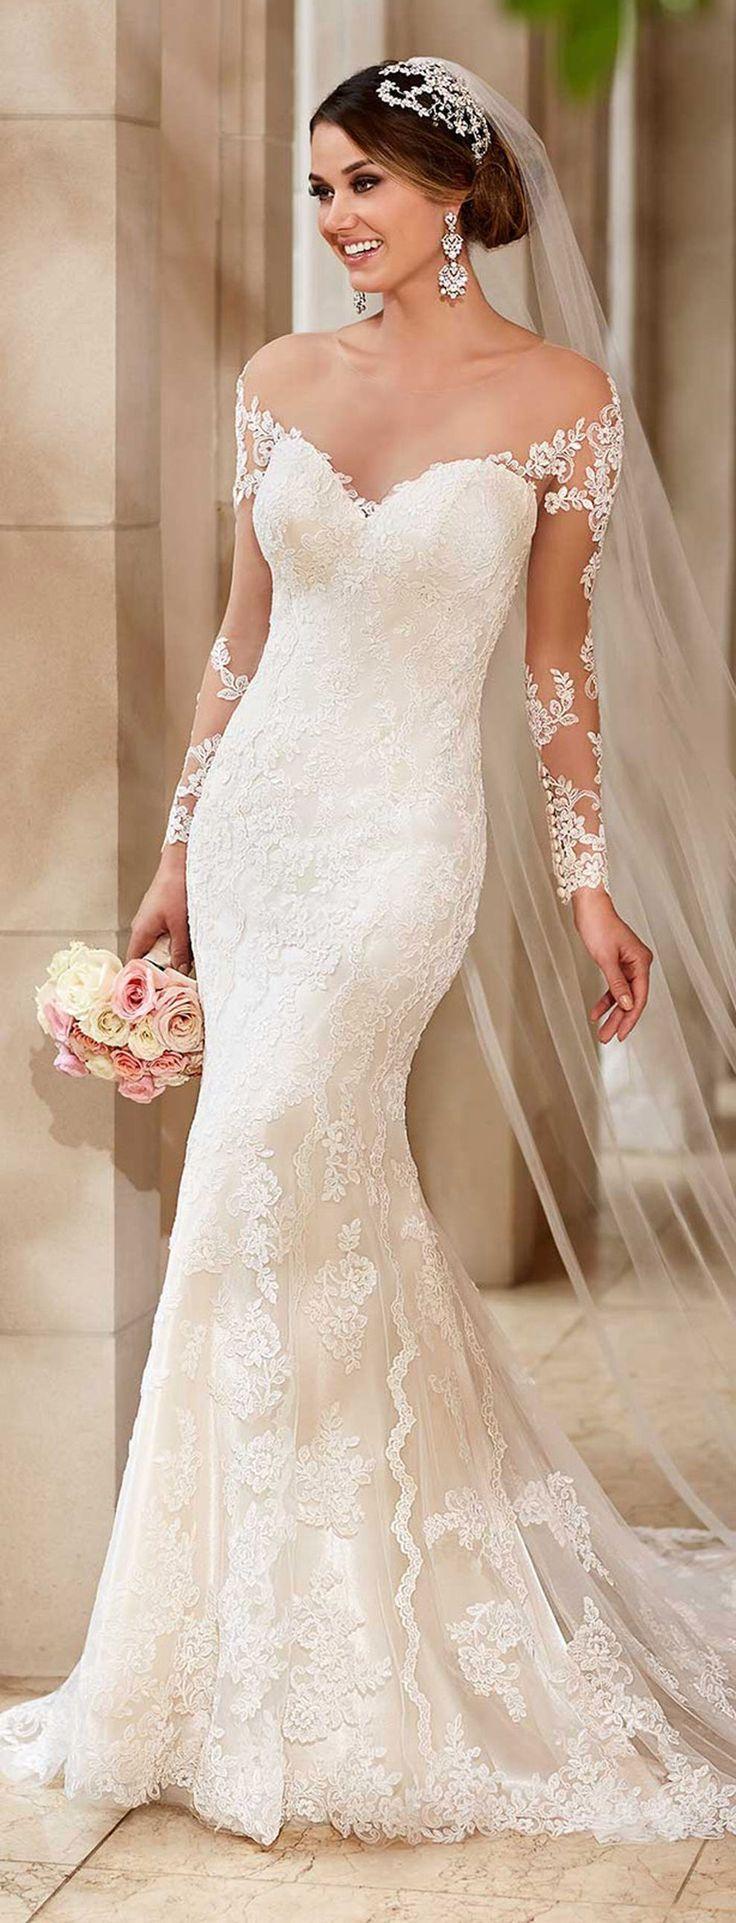 Best 25 Vineyard Wedding Dresses Ideas On Pinterest Beautiful Dress Designs Vineyard Wedding